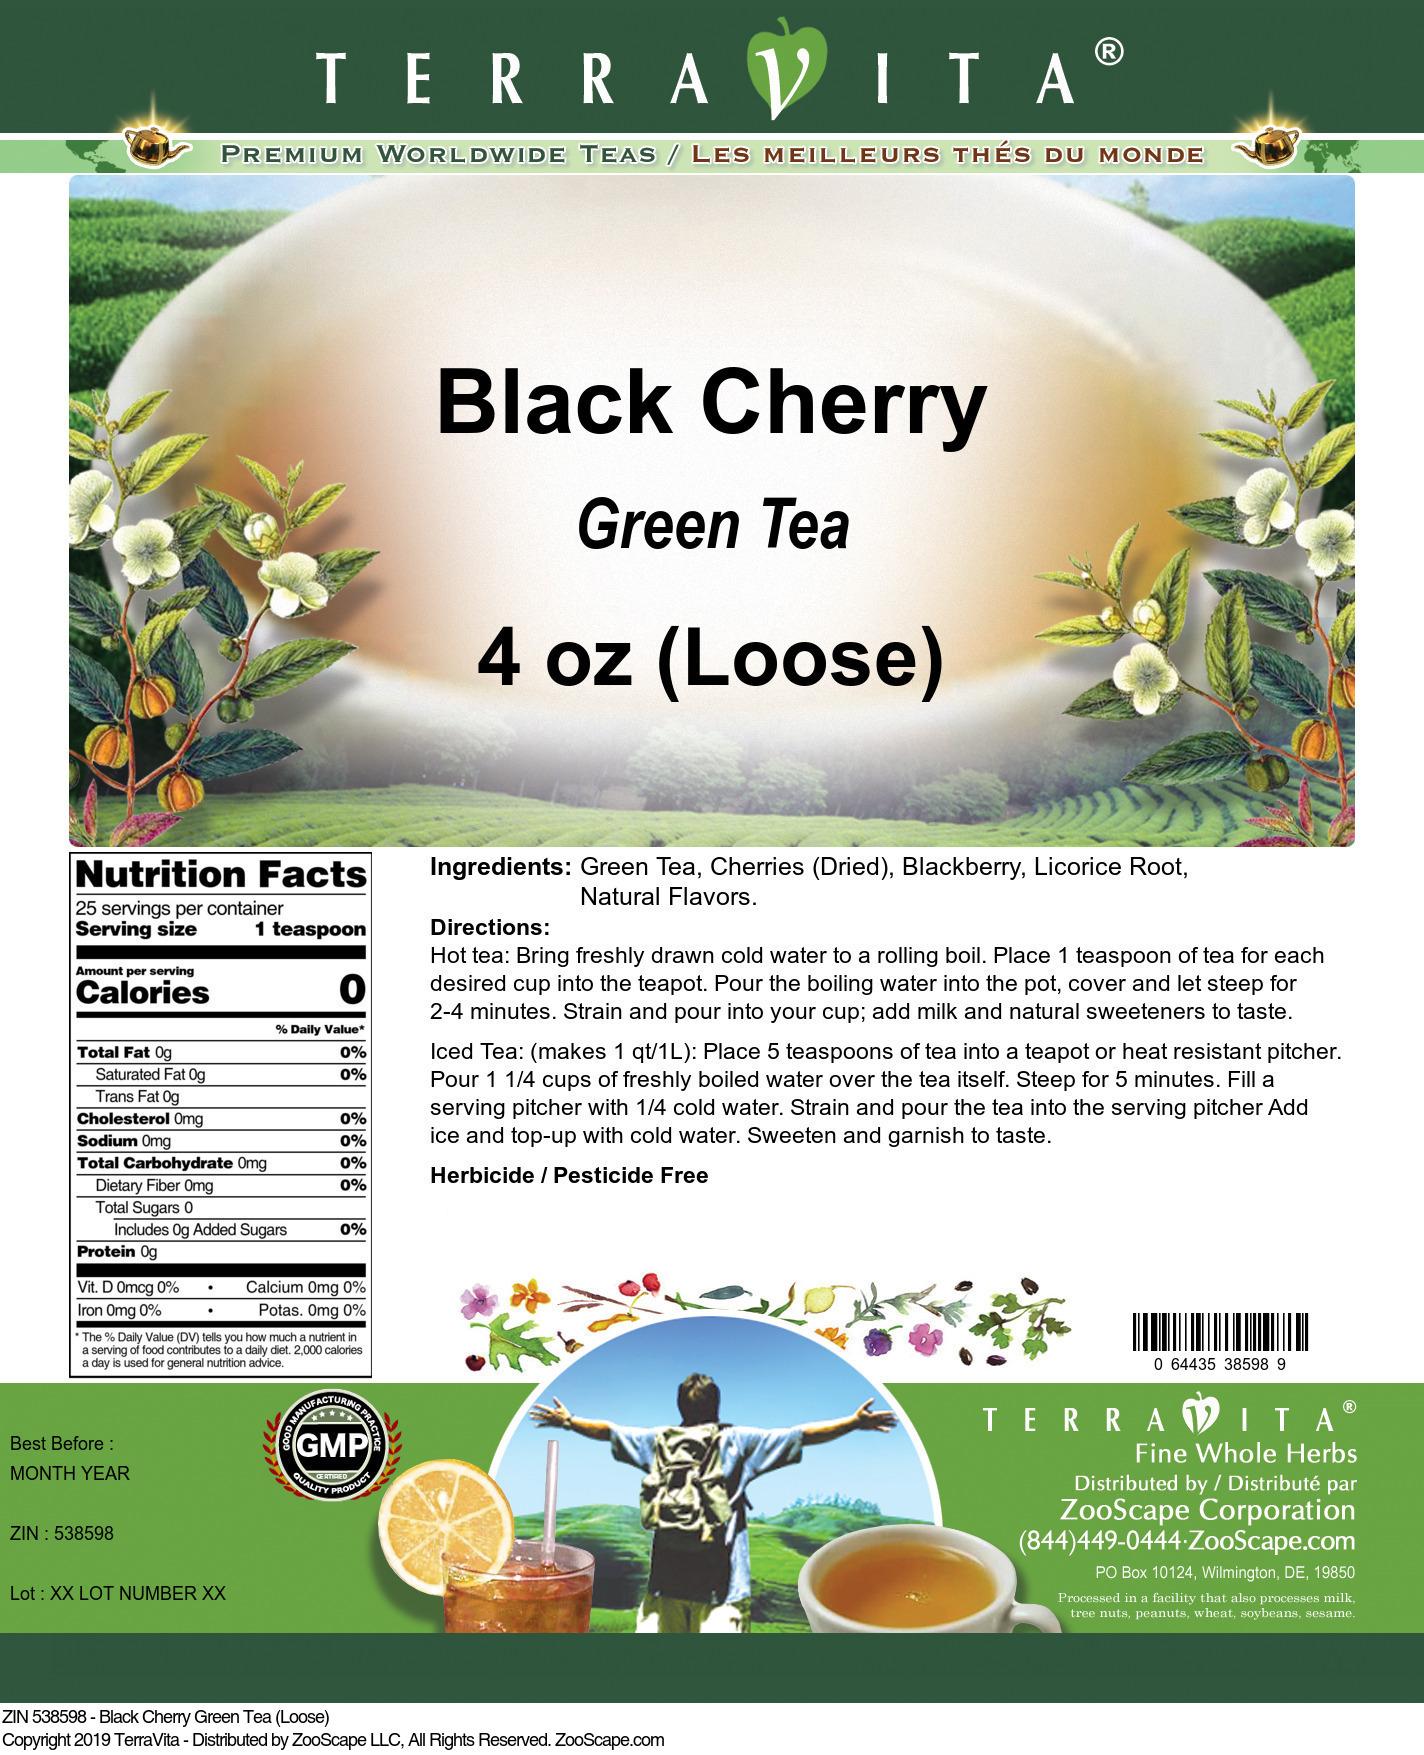 Black Cherry Green Tea (Loose)